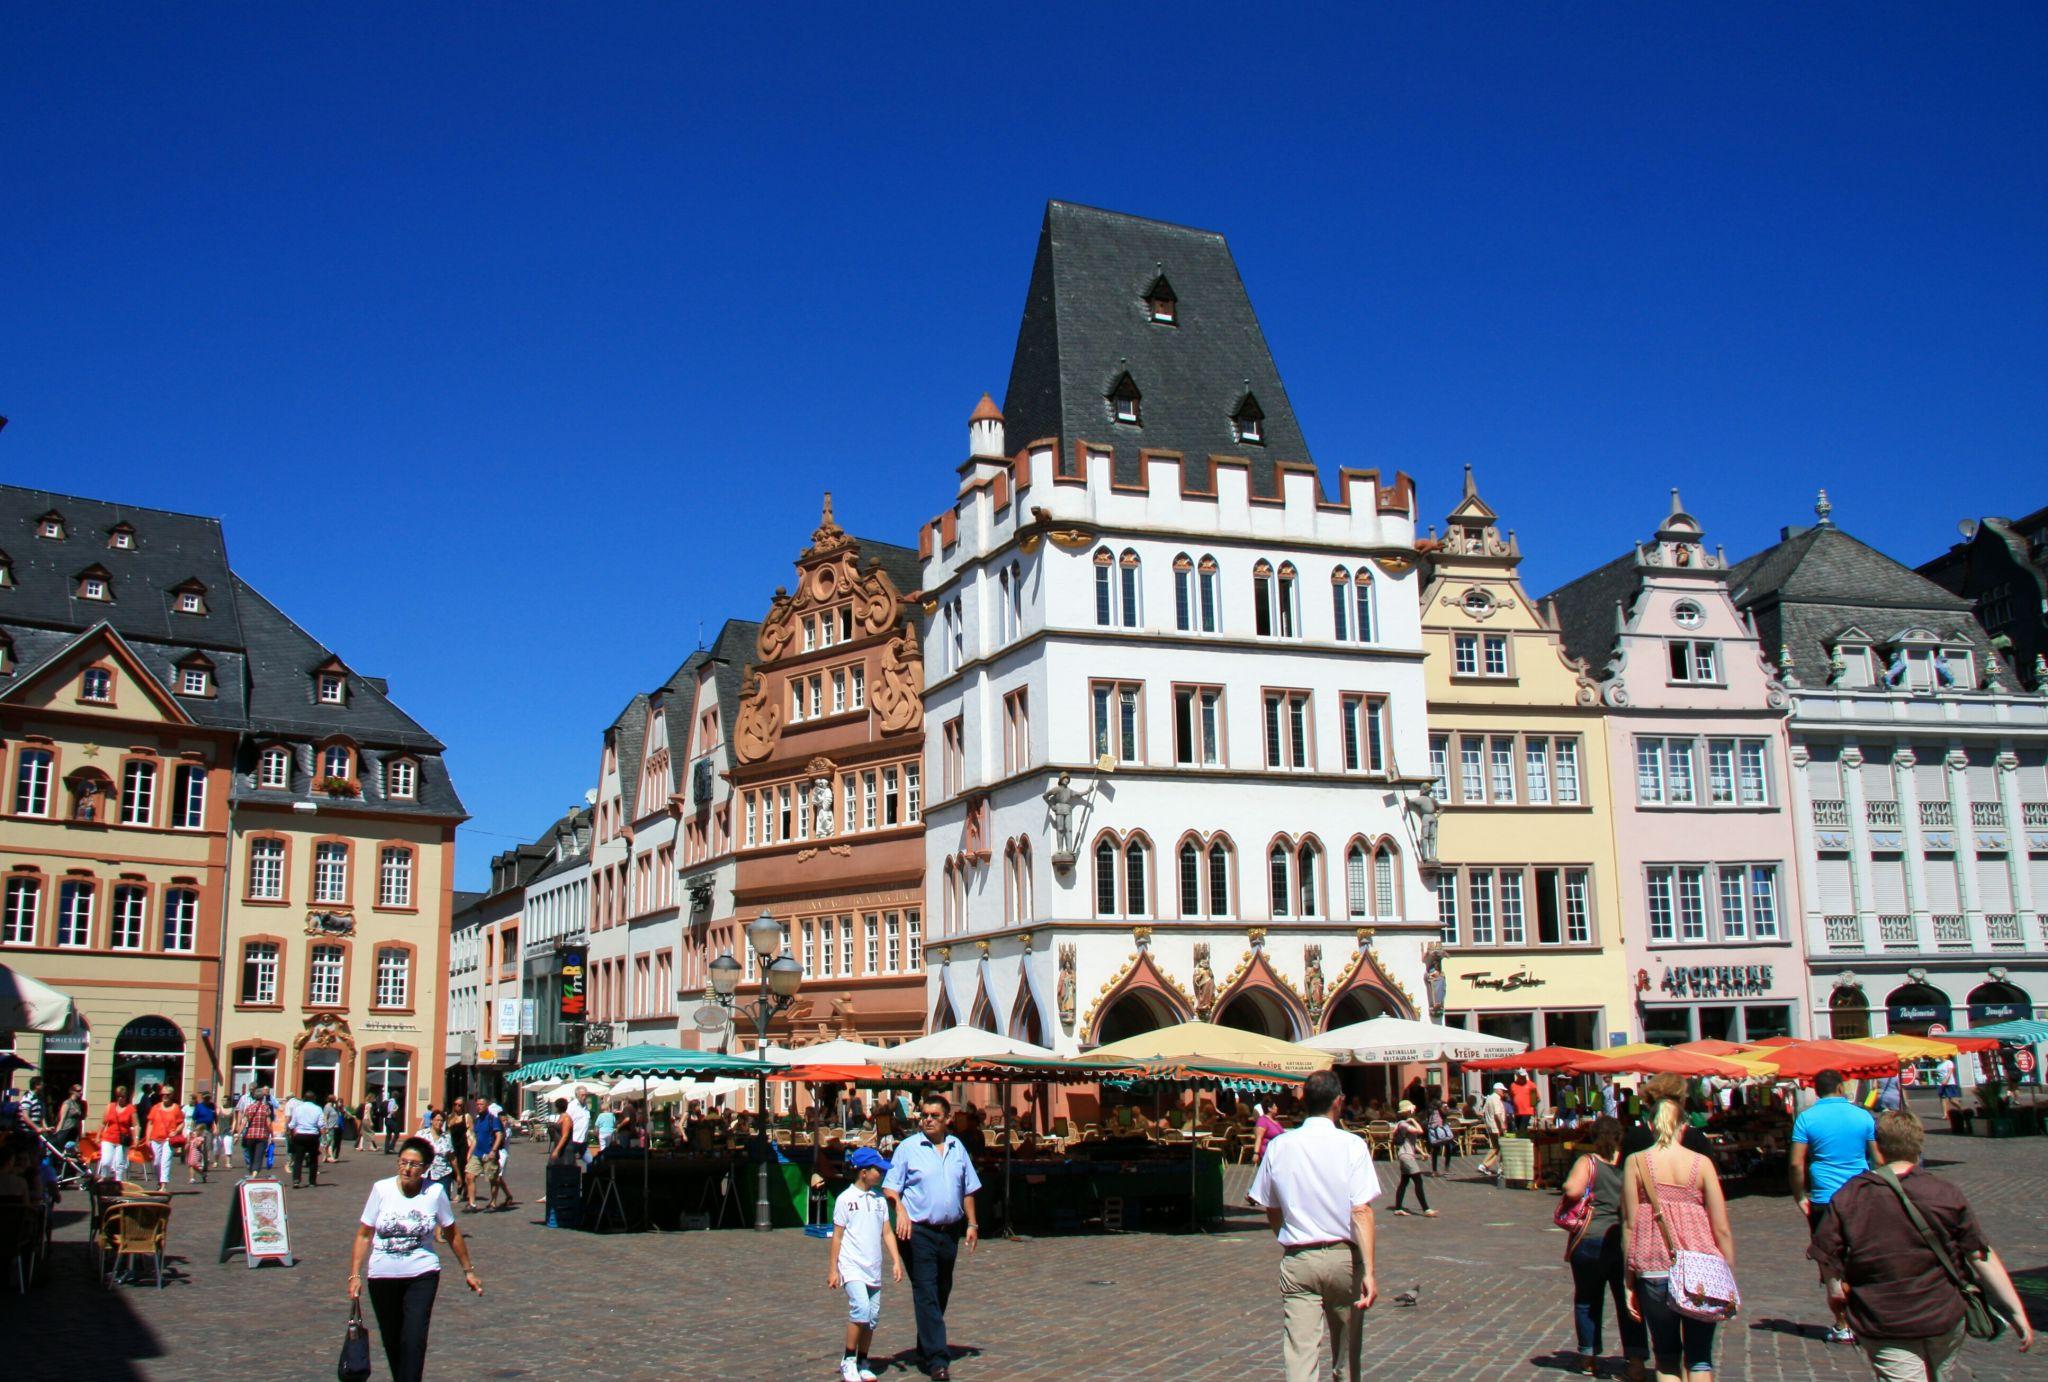 Hauptmarkt, Trier, Germany